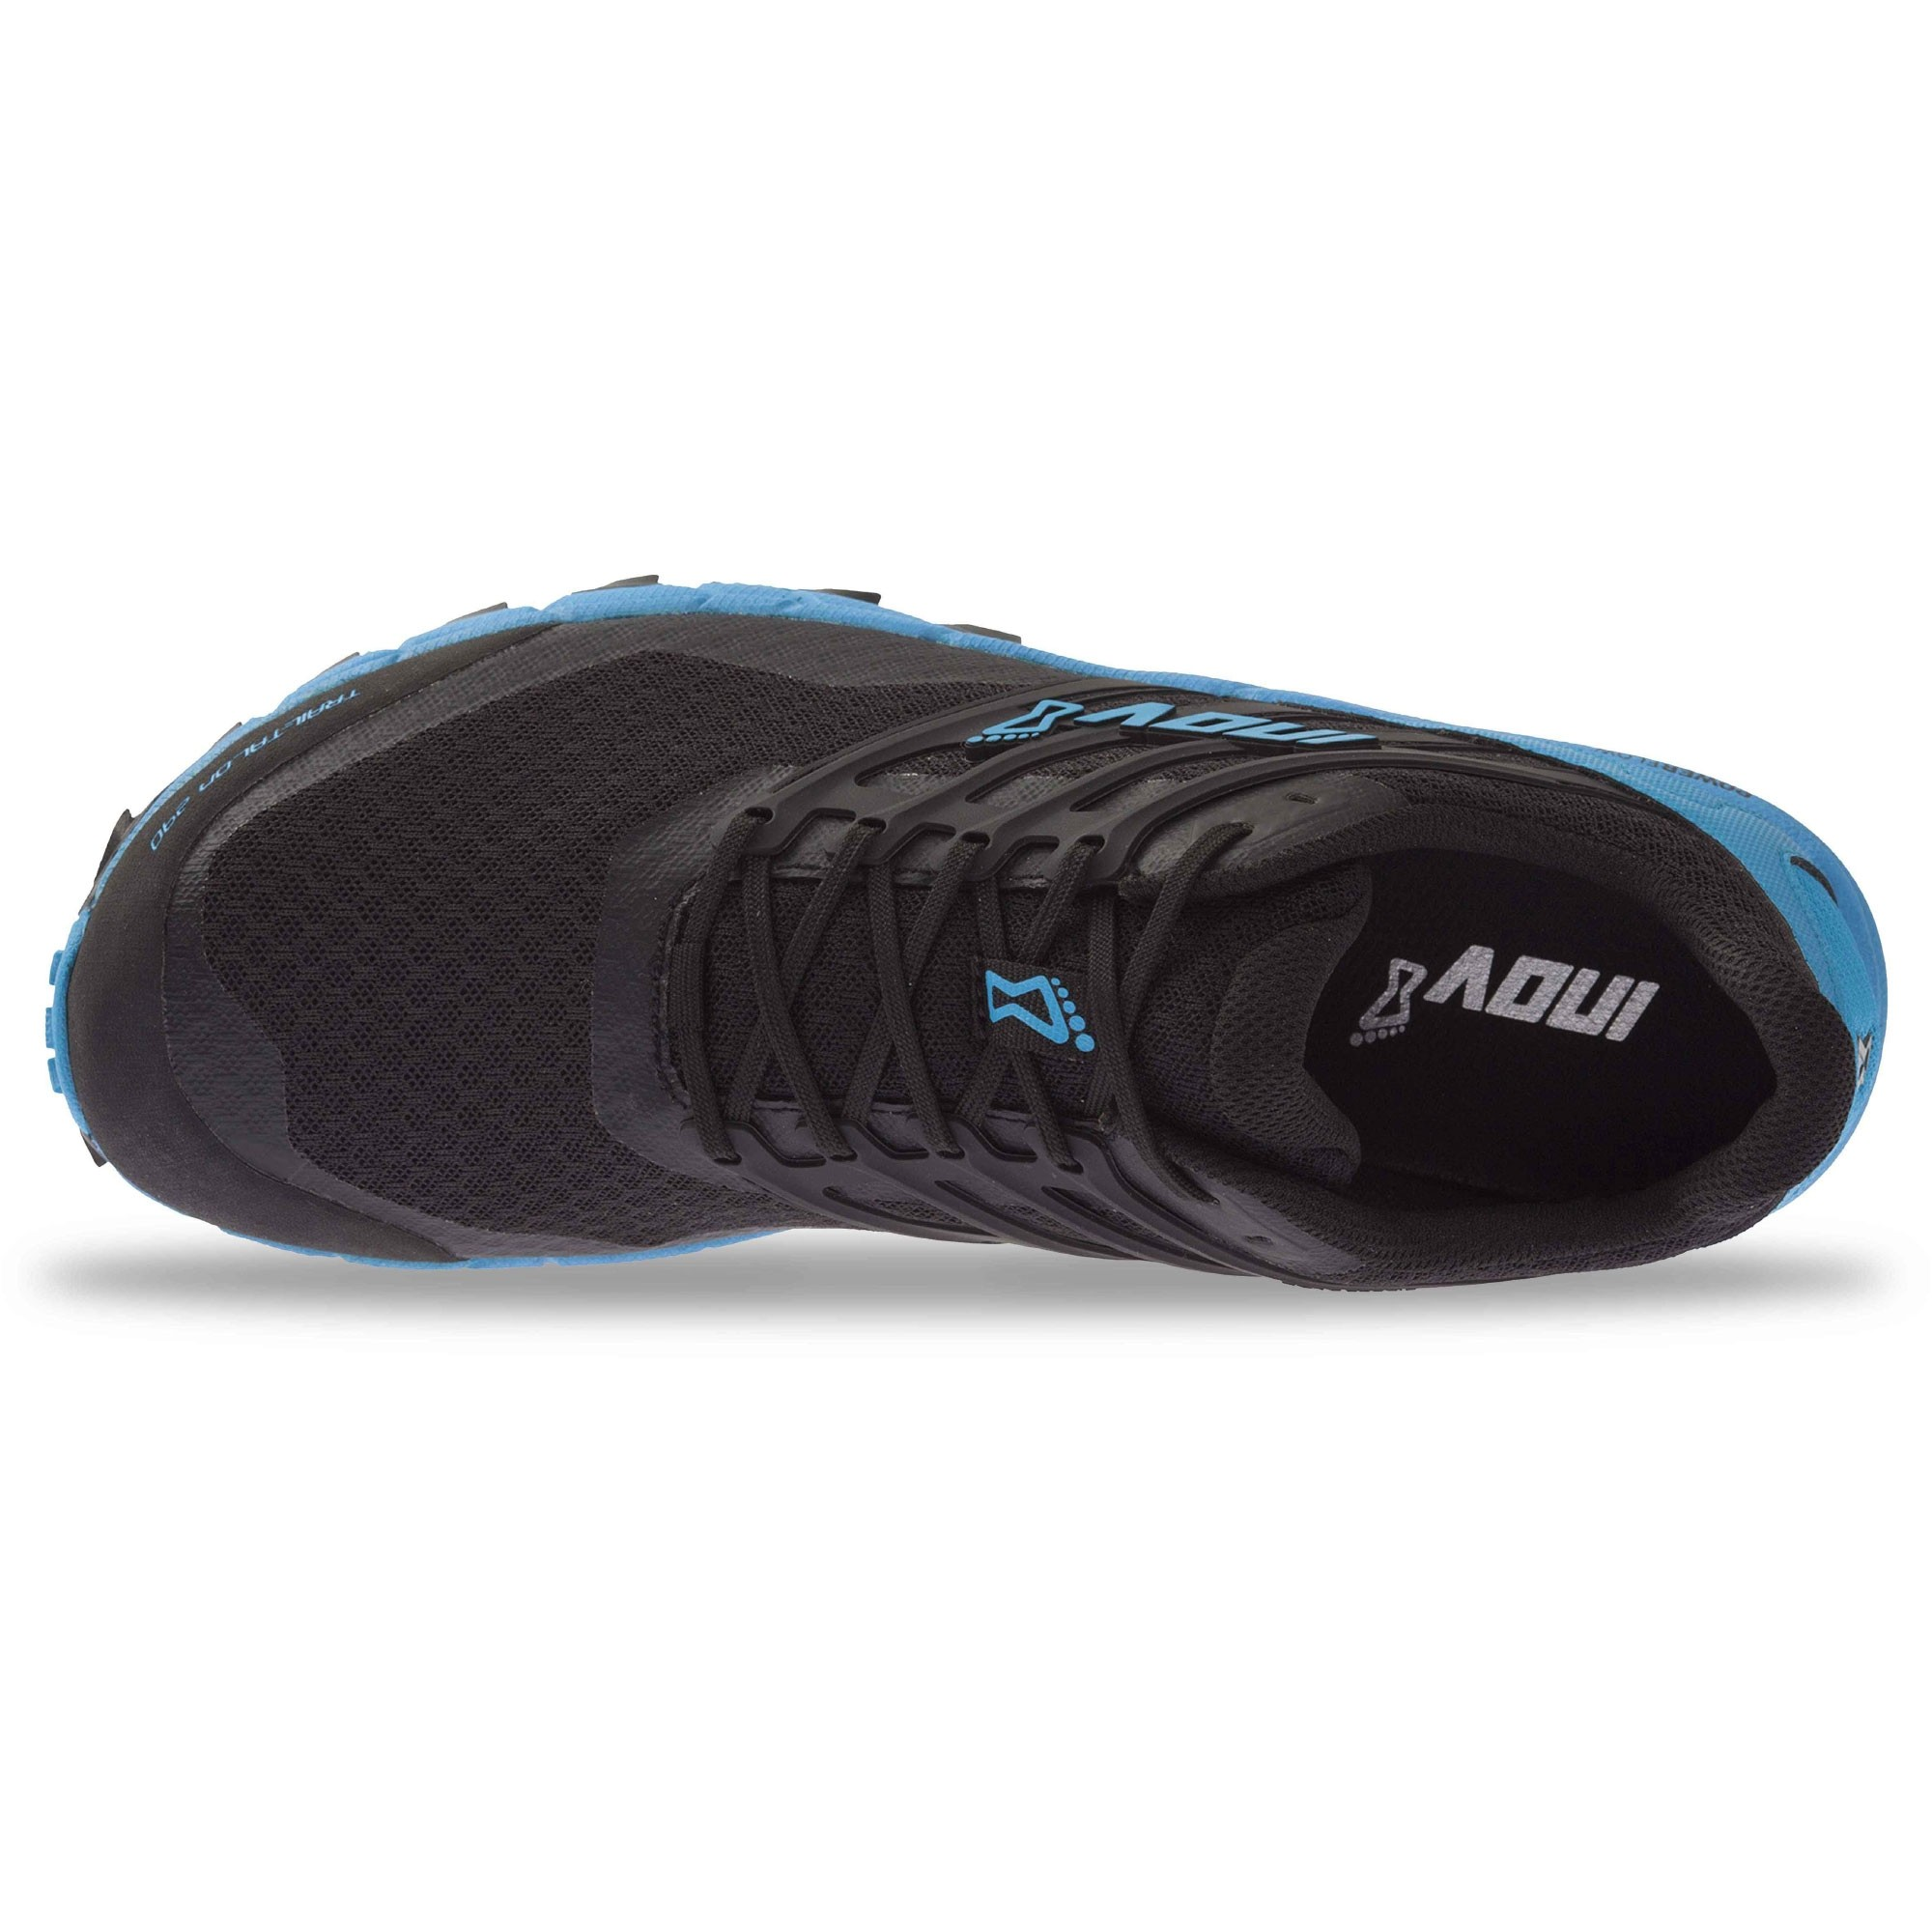 Inov8 Trail Talon 290 Trail Running Shoes - Black/Blue - Top